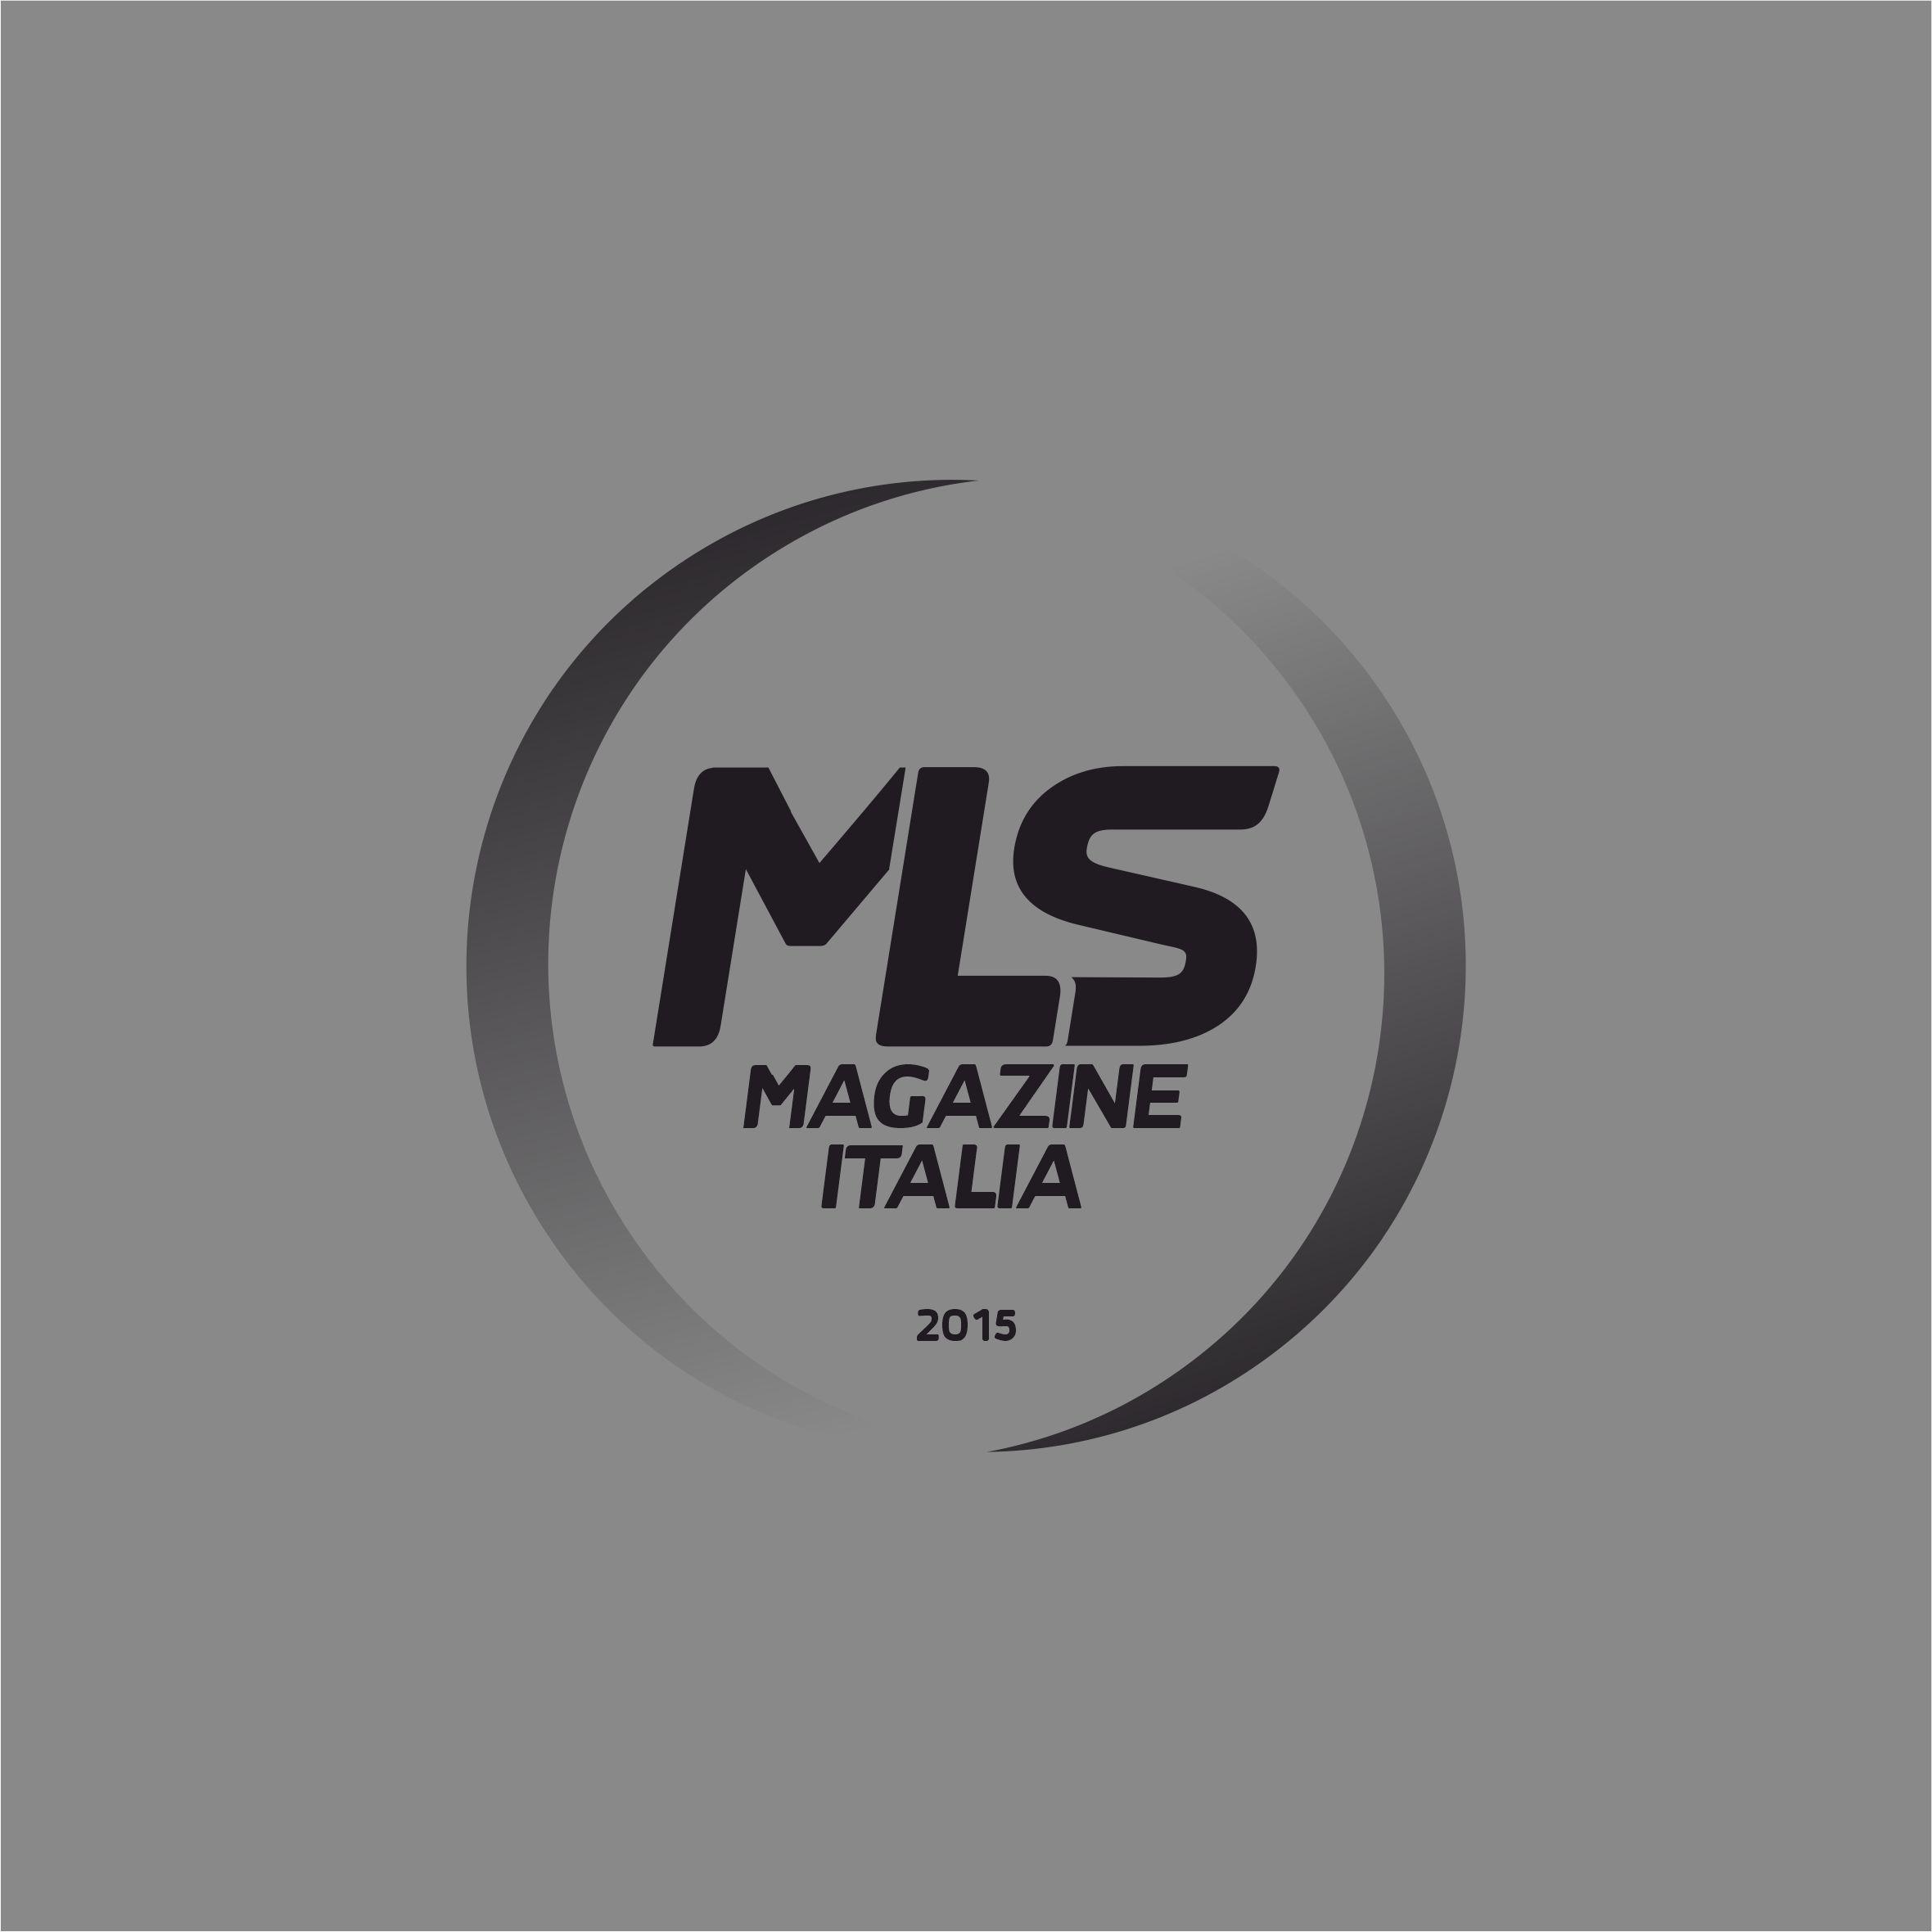 logo MLS Magazine Italia   MLS Magazine Italia